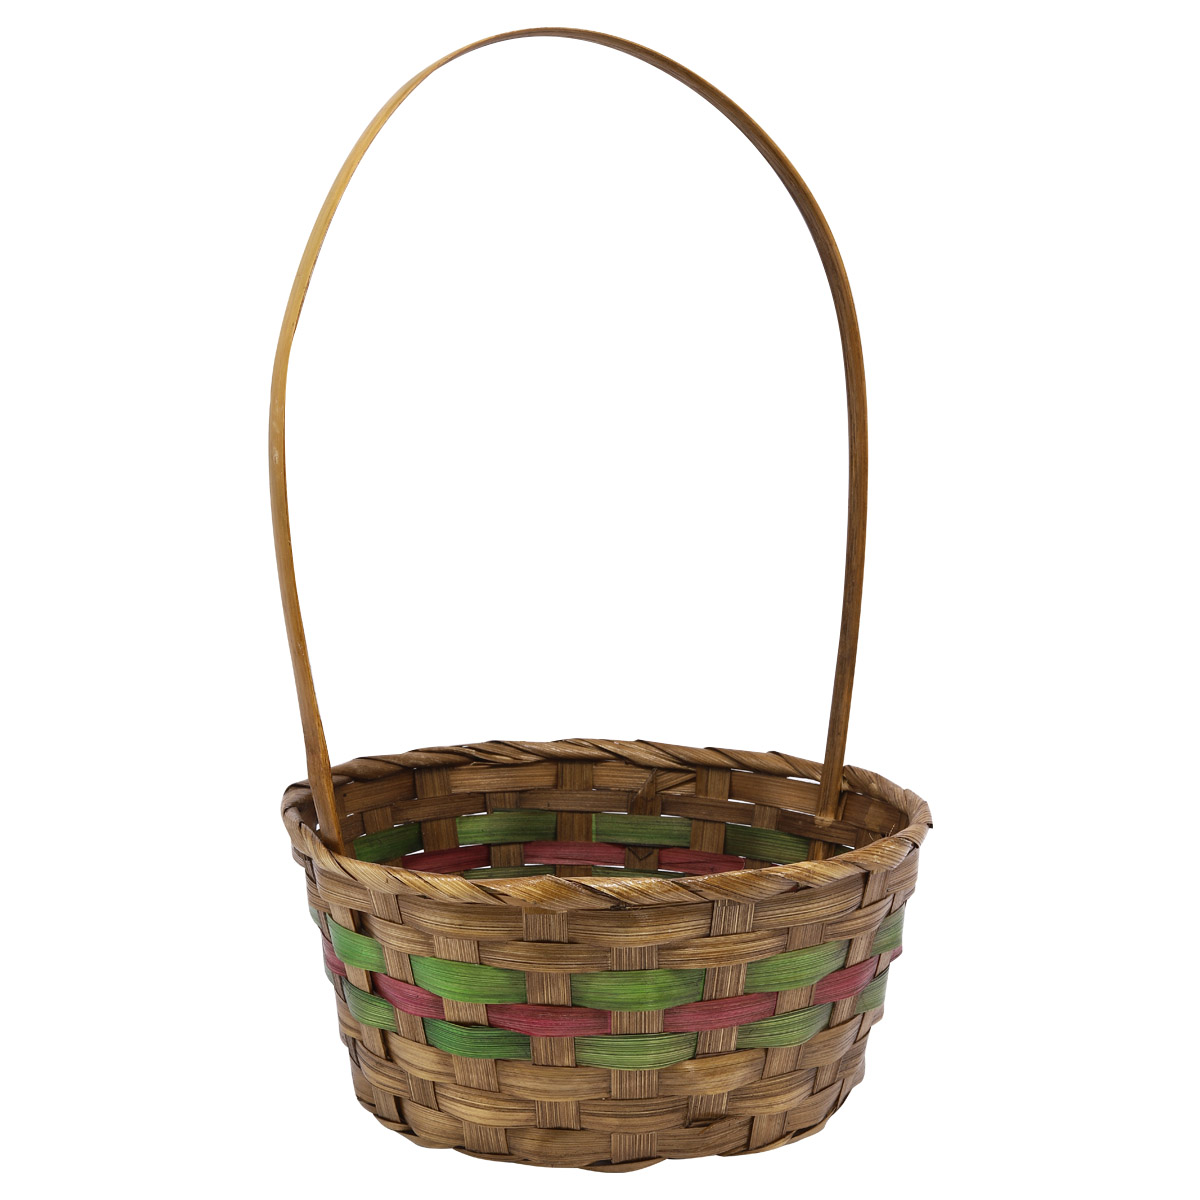 19HJ19093 Корзина плетеная бамбук 'L' 23*11*H38см, цв. коричневый Астра